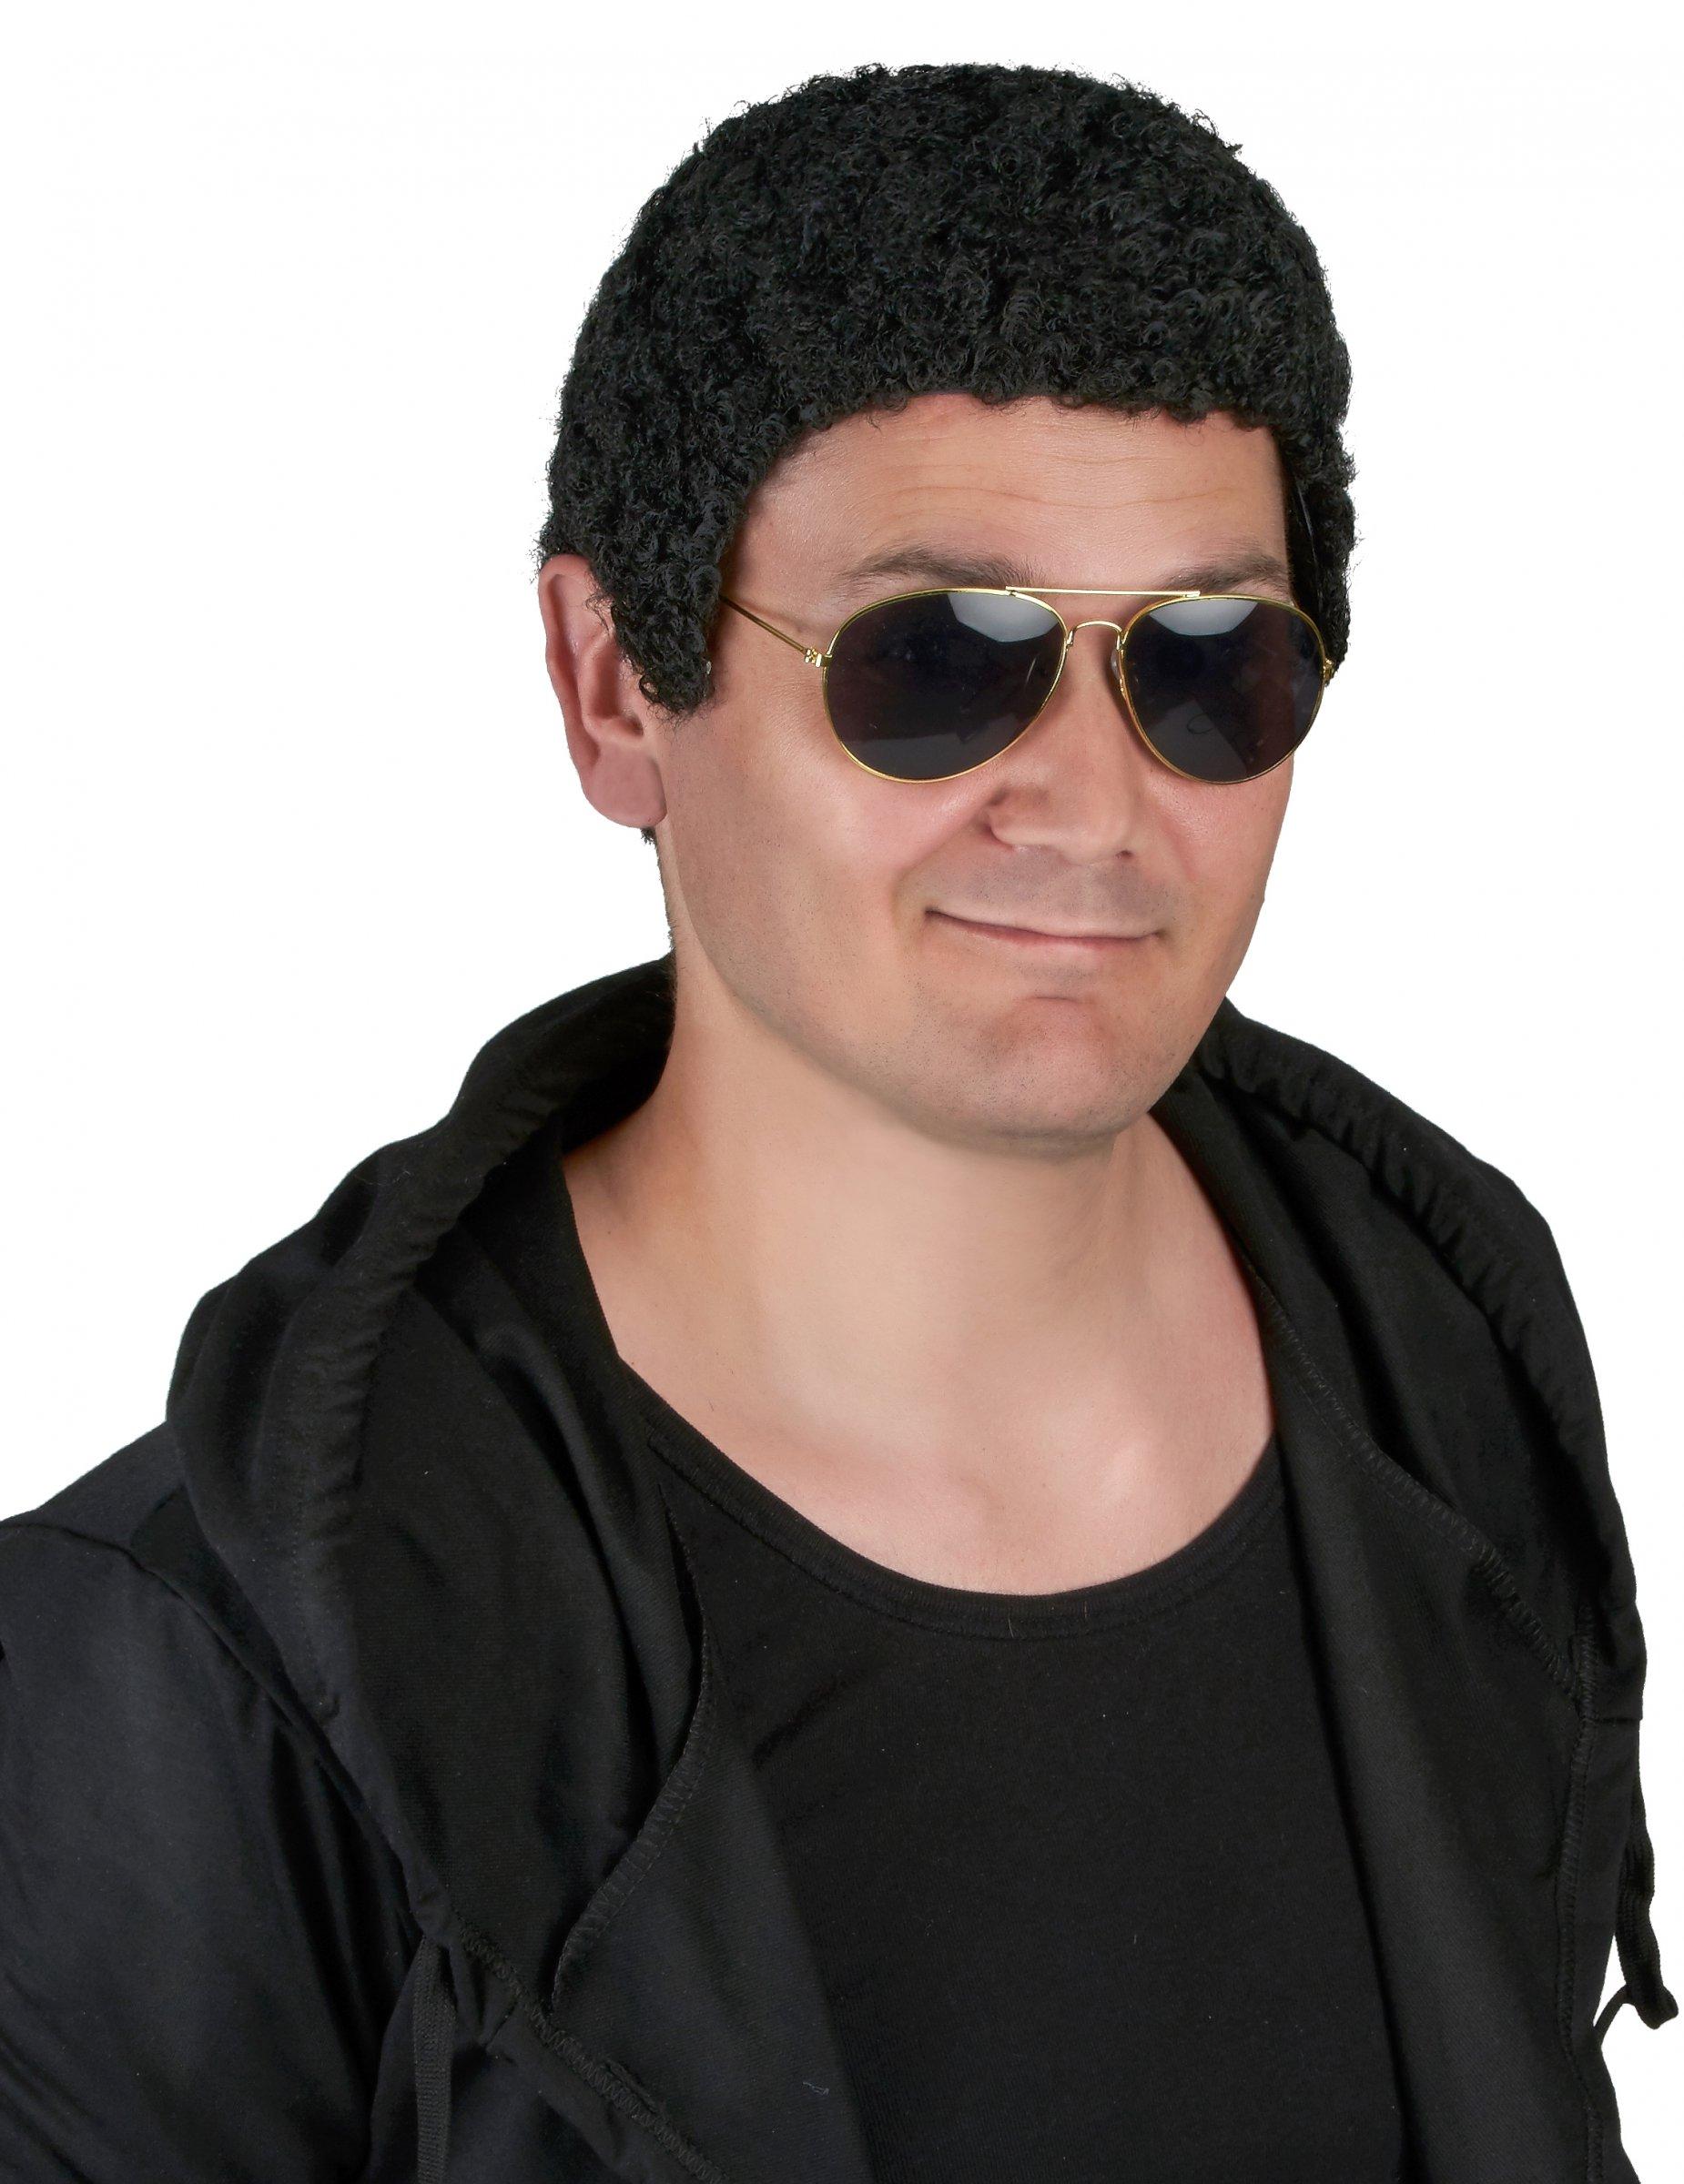 Wigs For Men 61